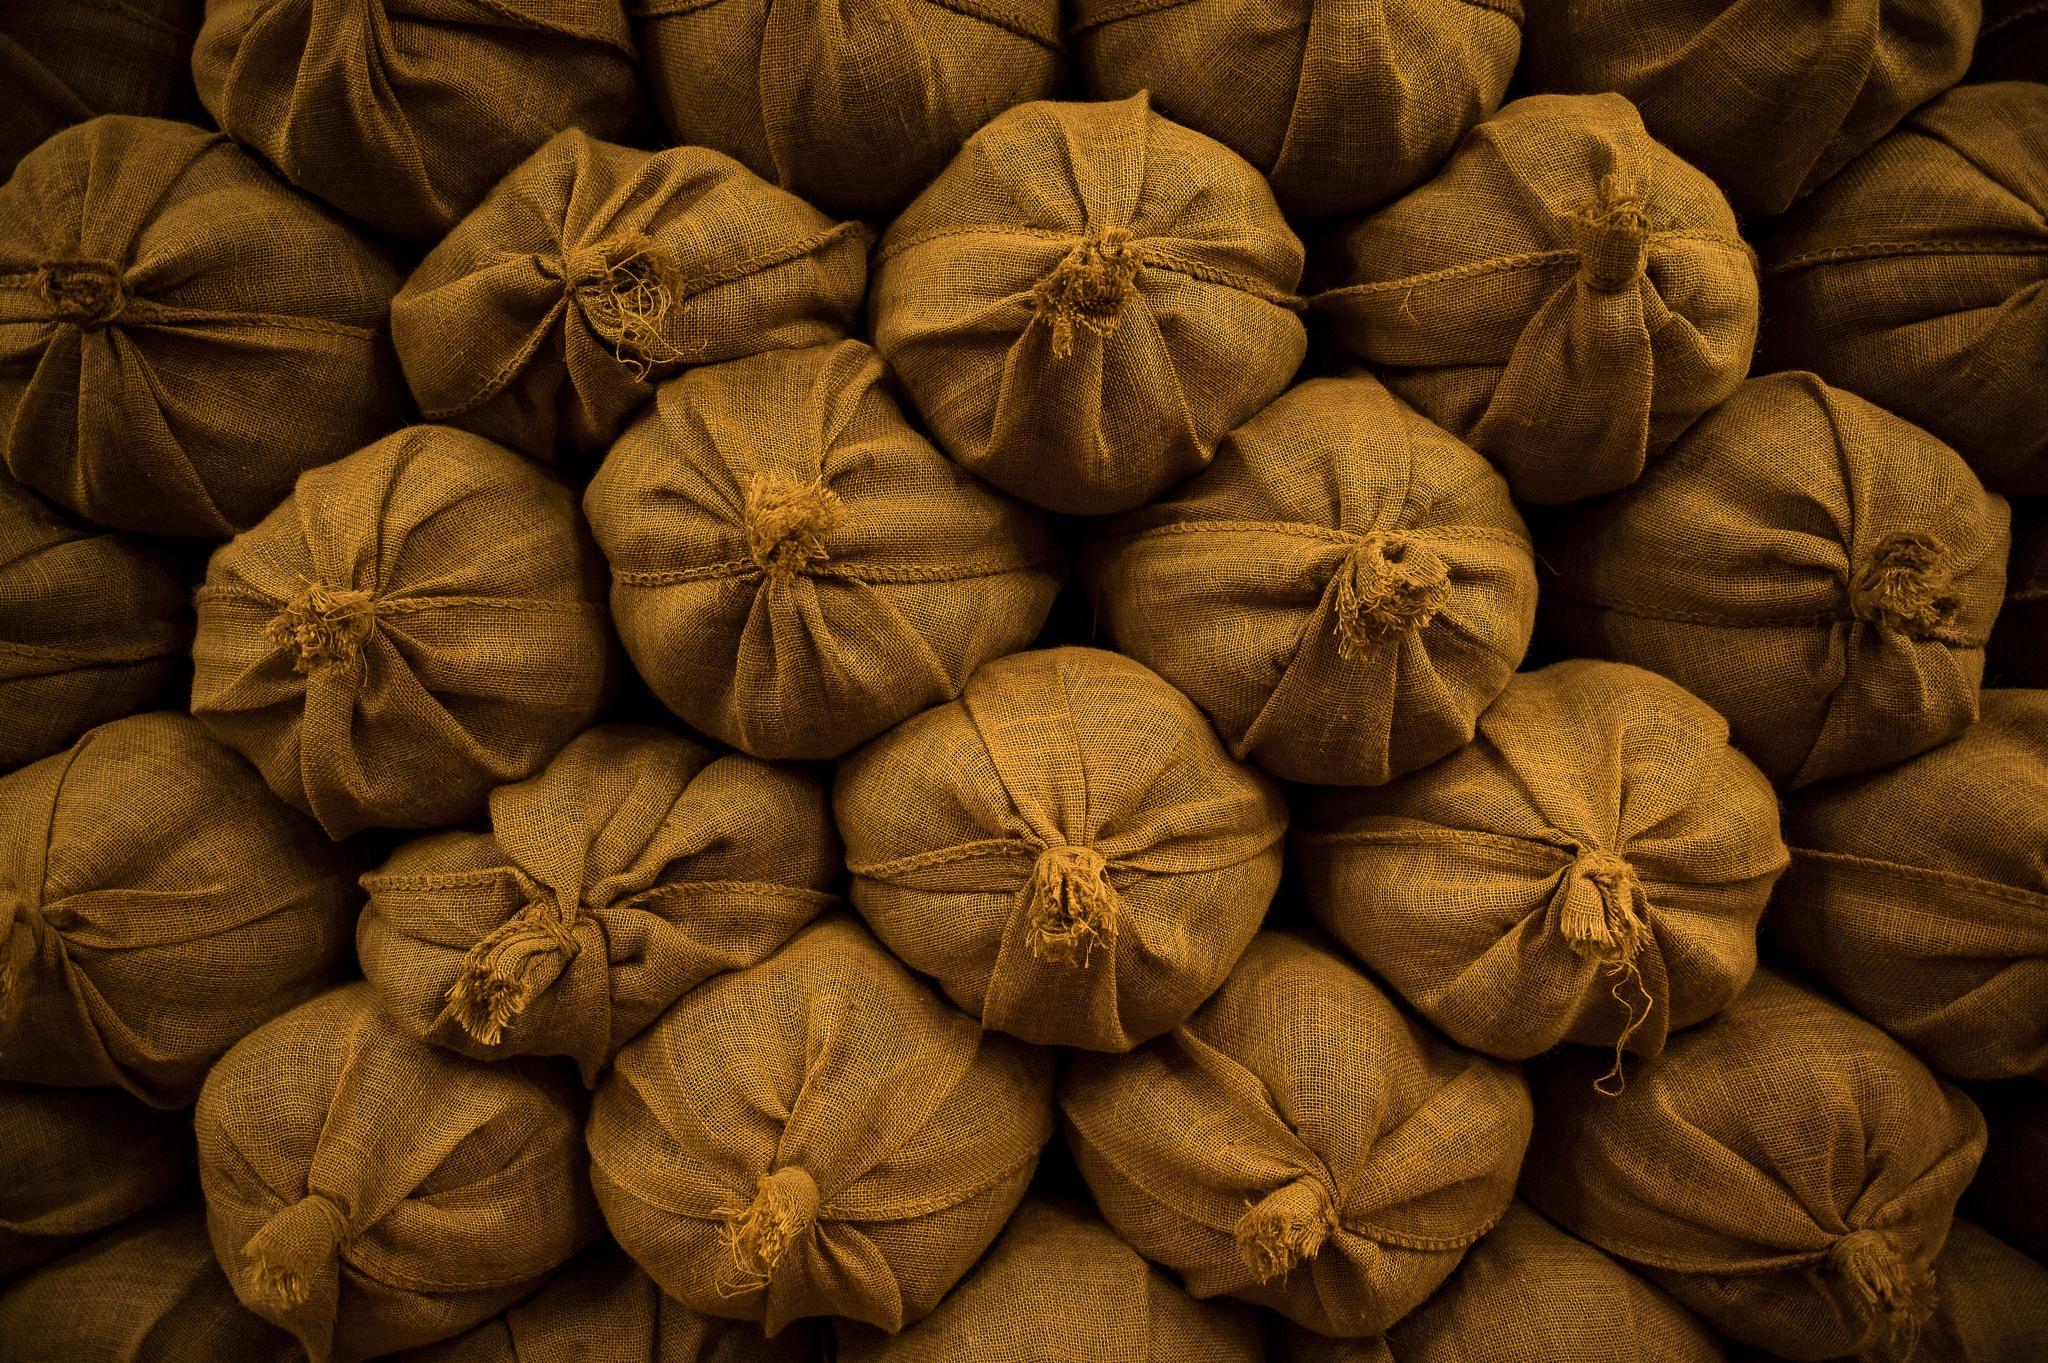 Stacks of grain bags by Kai Kim